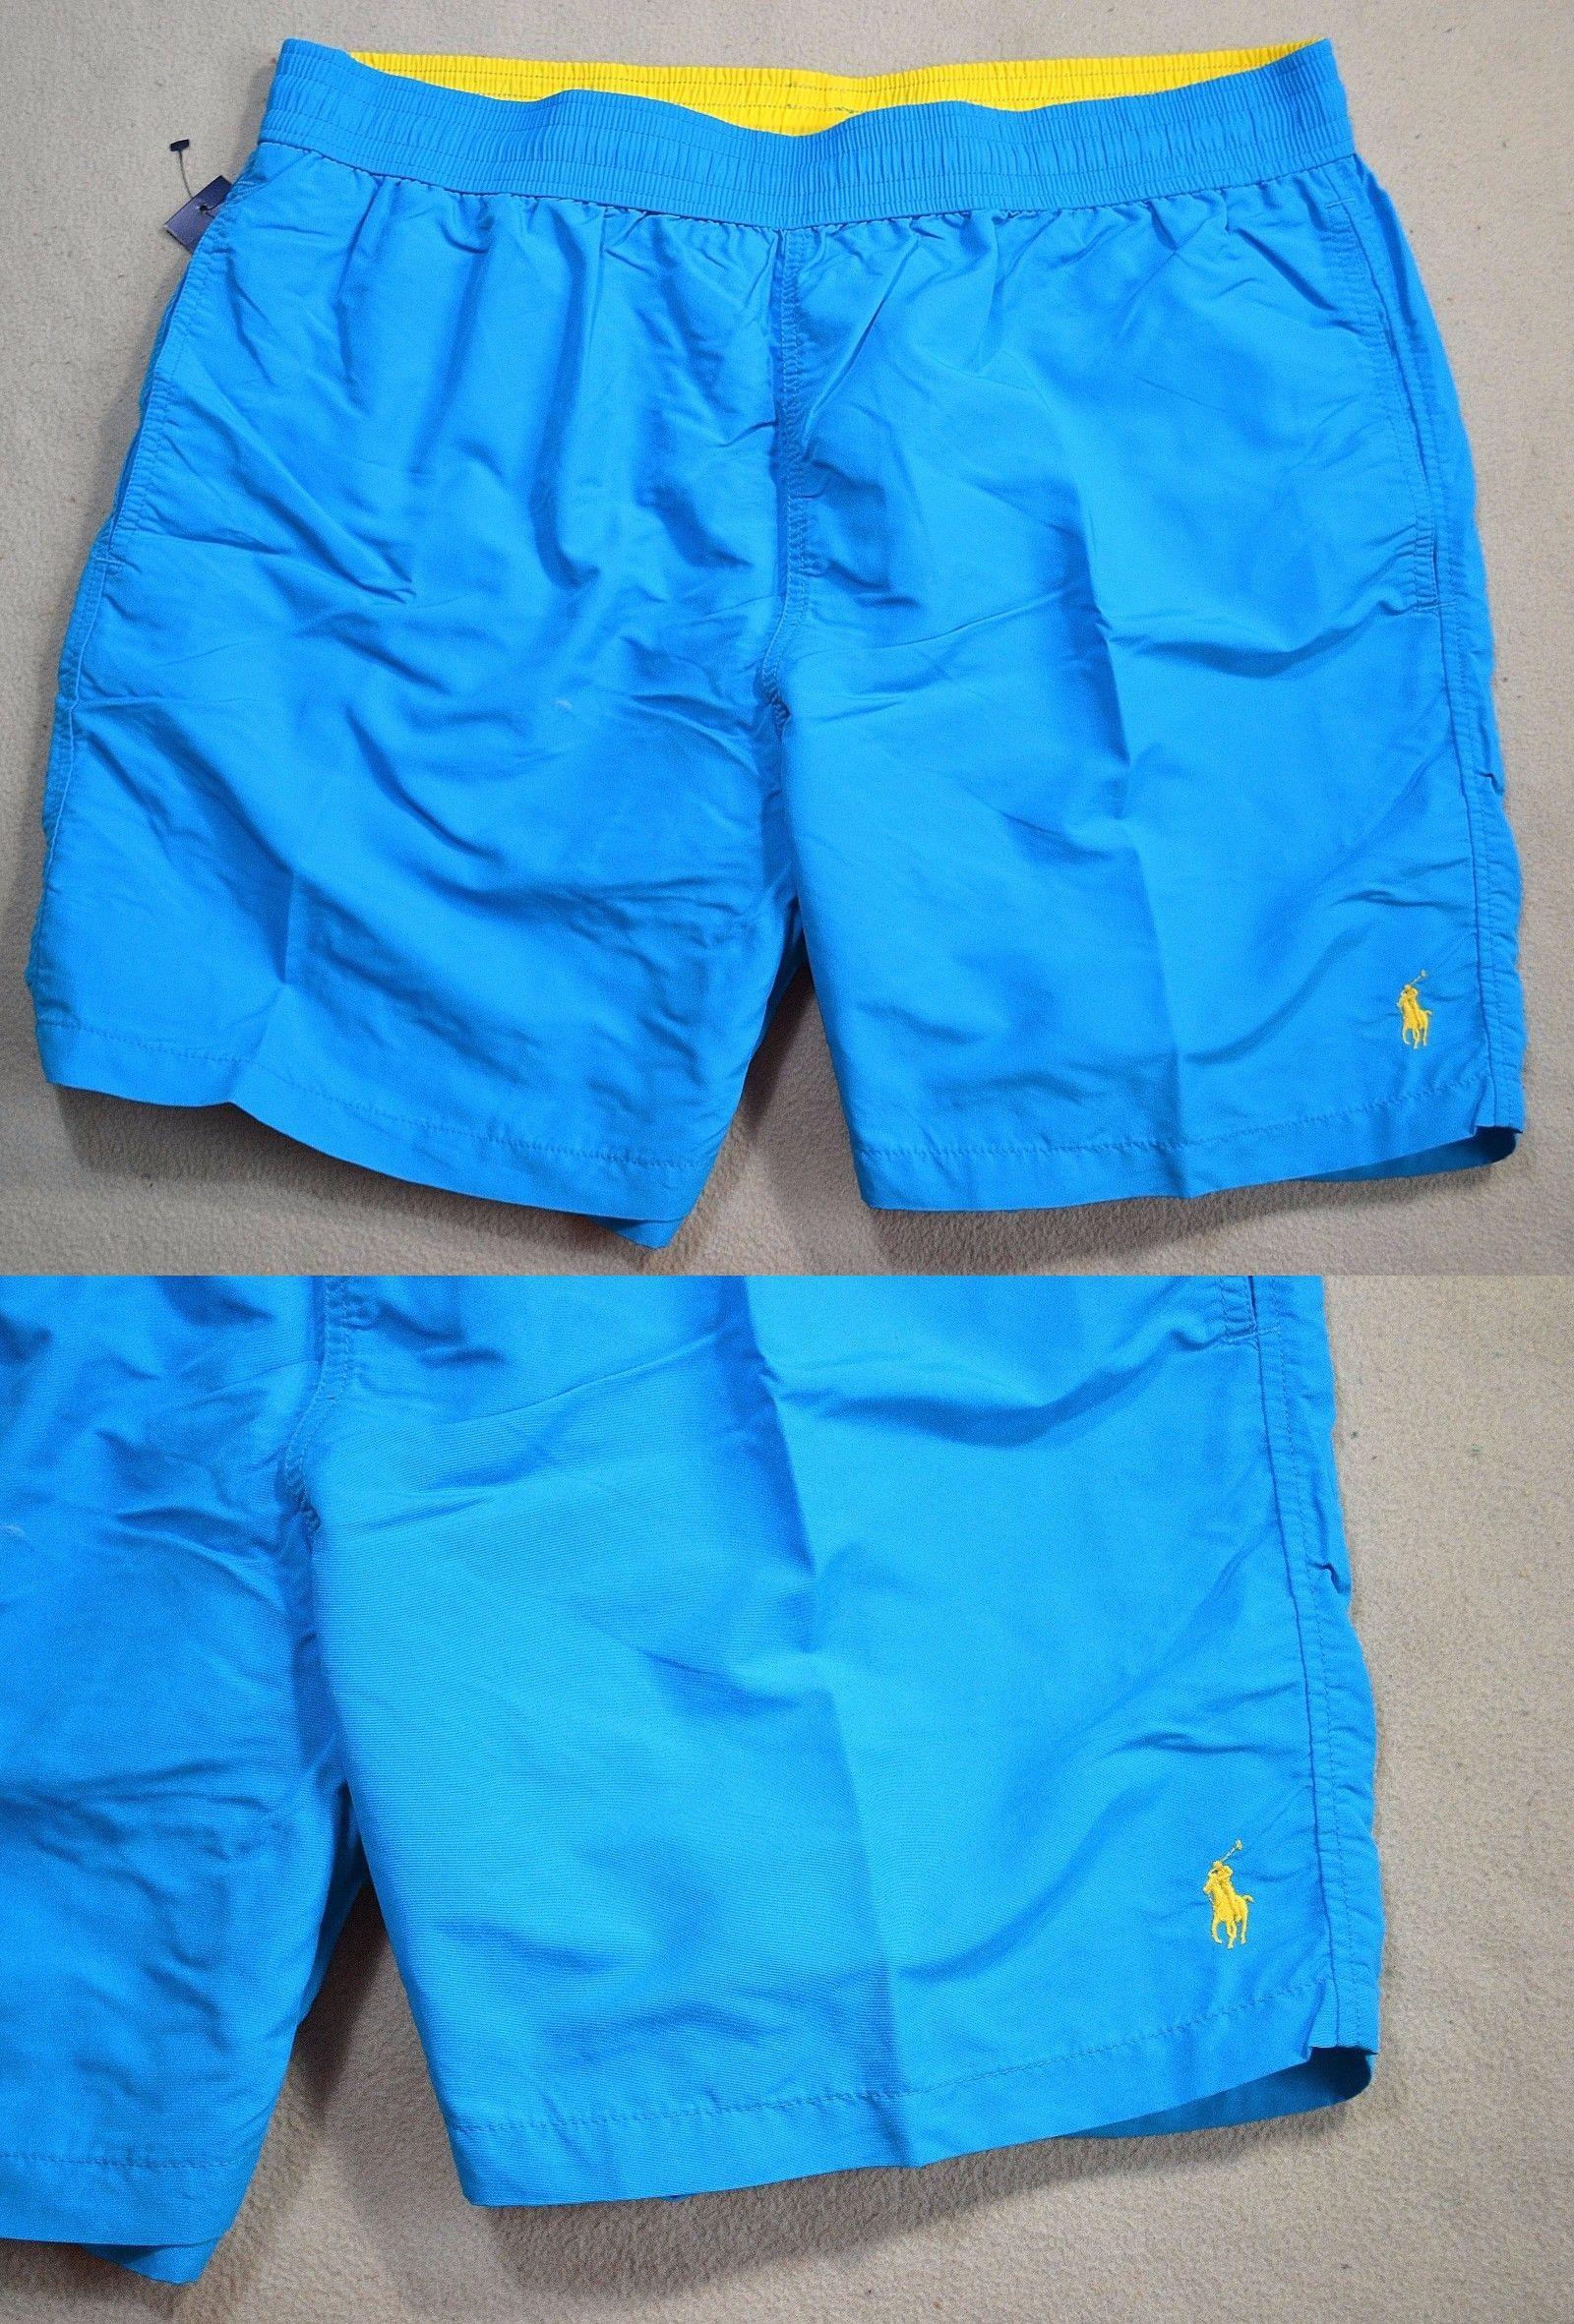 e8c6096b8a ... switzerland swimwear 15690 nwt mens polo ralph lauren classic haw ocean board  shorts swim trunks sz